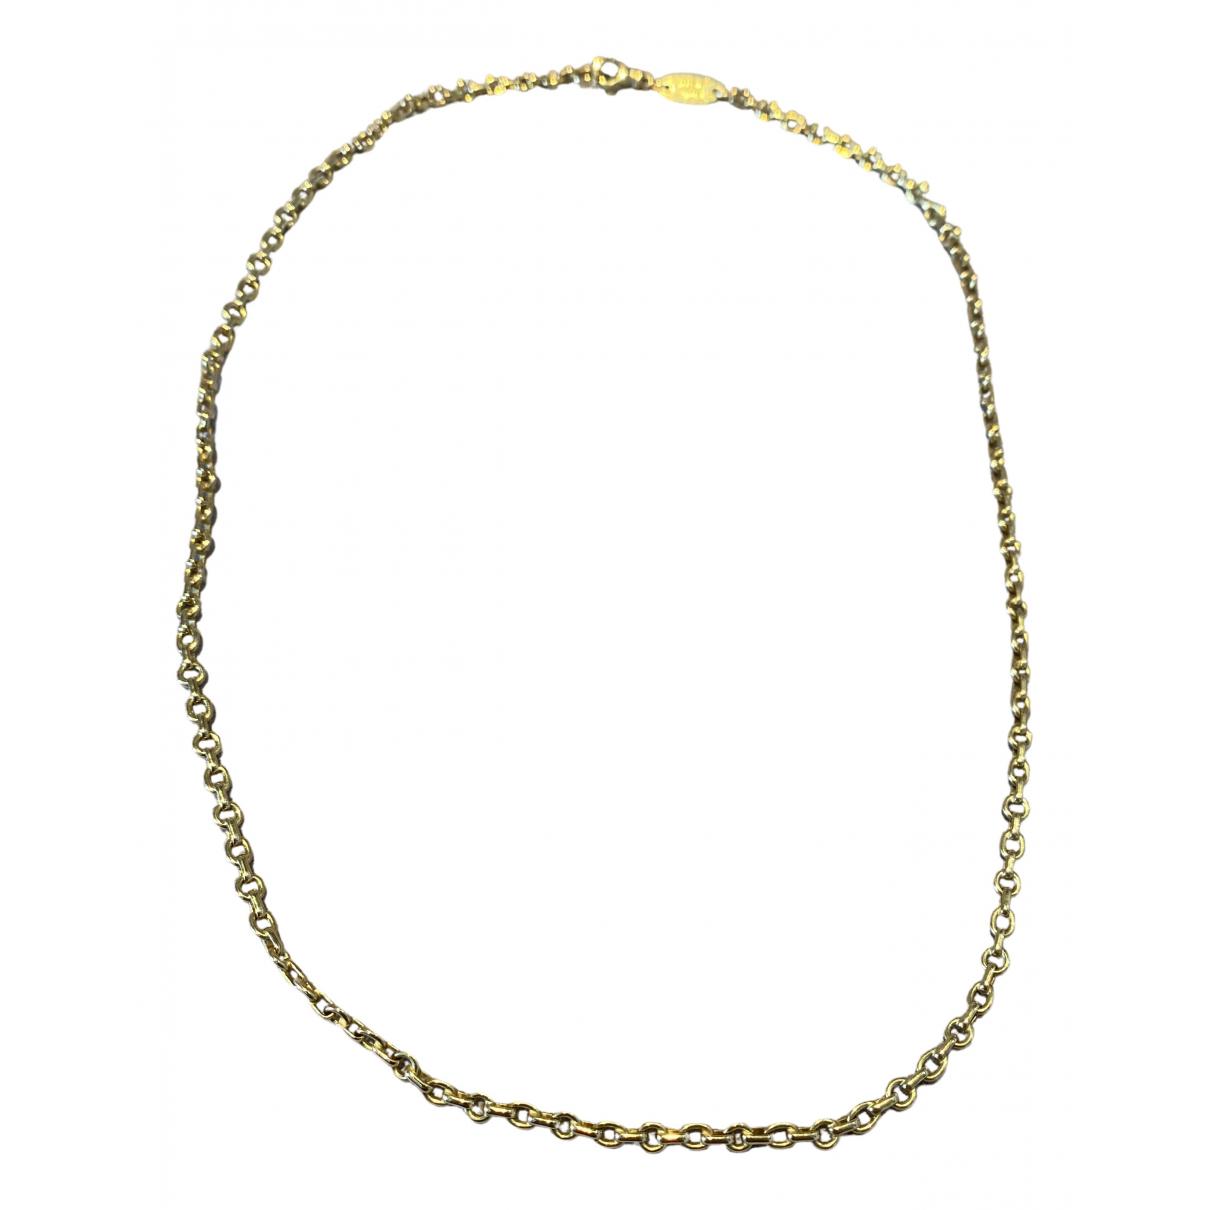 Collar de Oro amarillo Chaumet